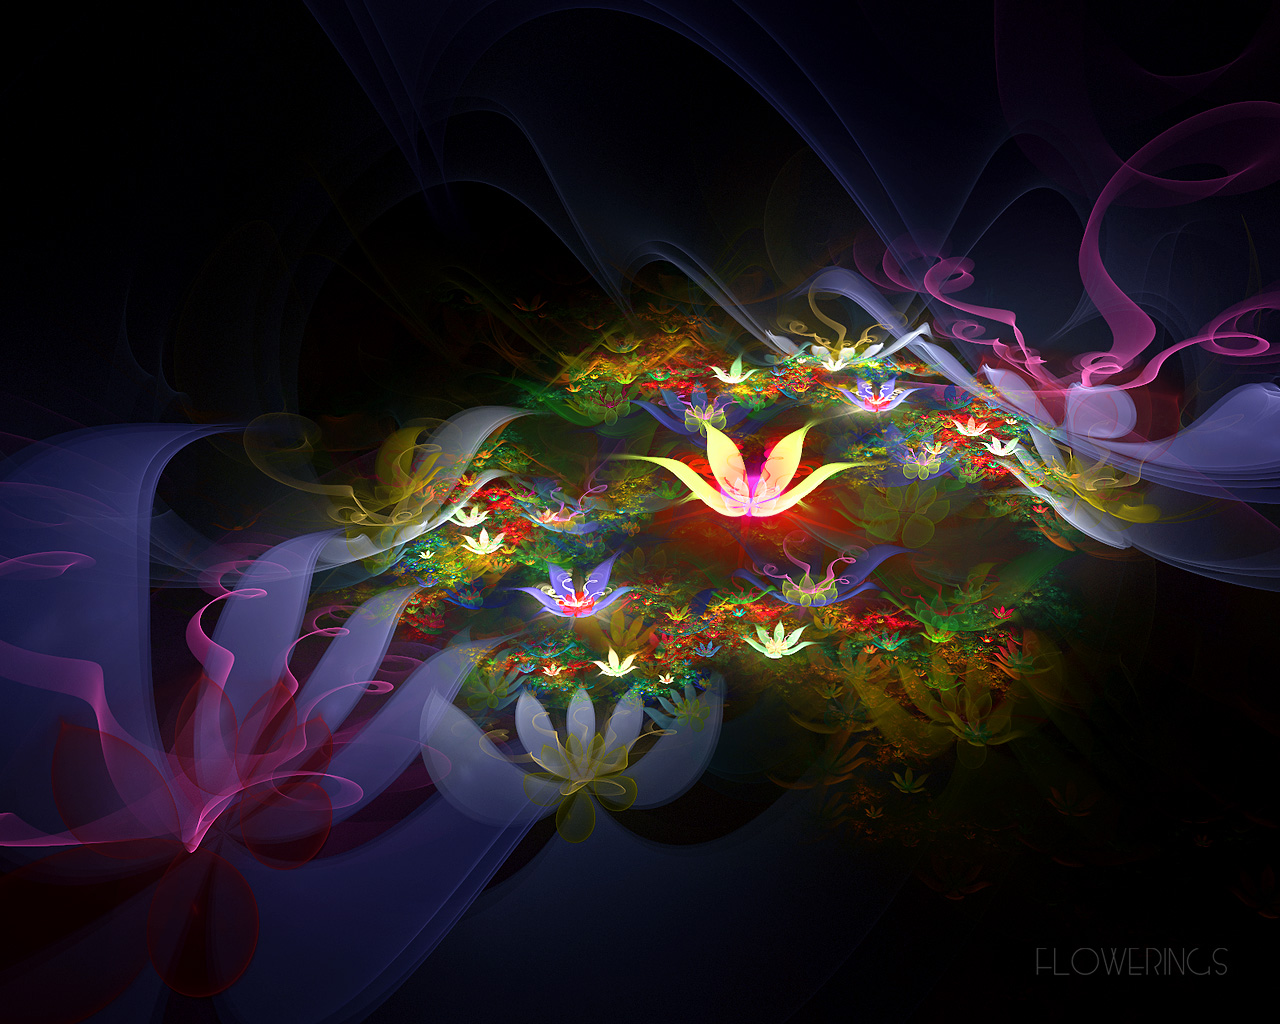 3d Flowers HD Wallpaper Download Hd Wallpapers 2u Download 1280x1024